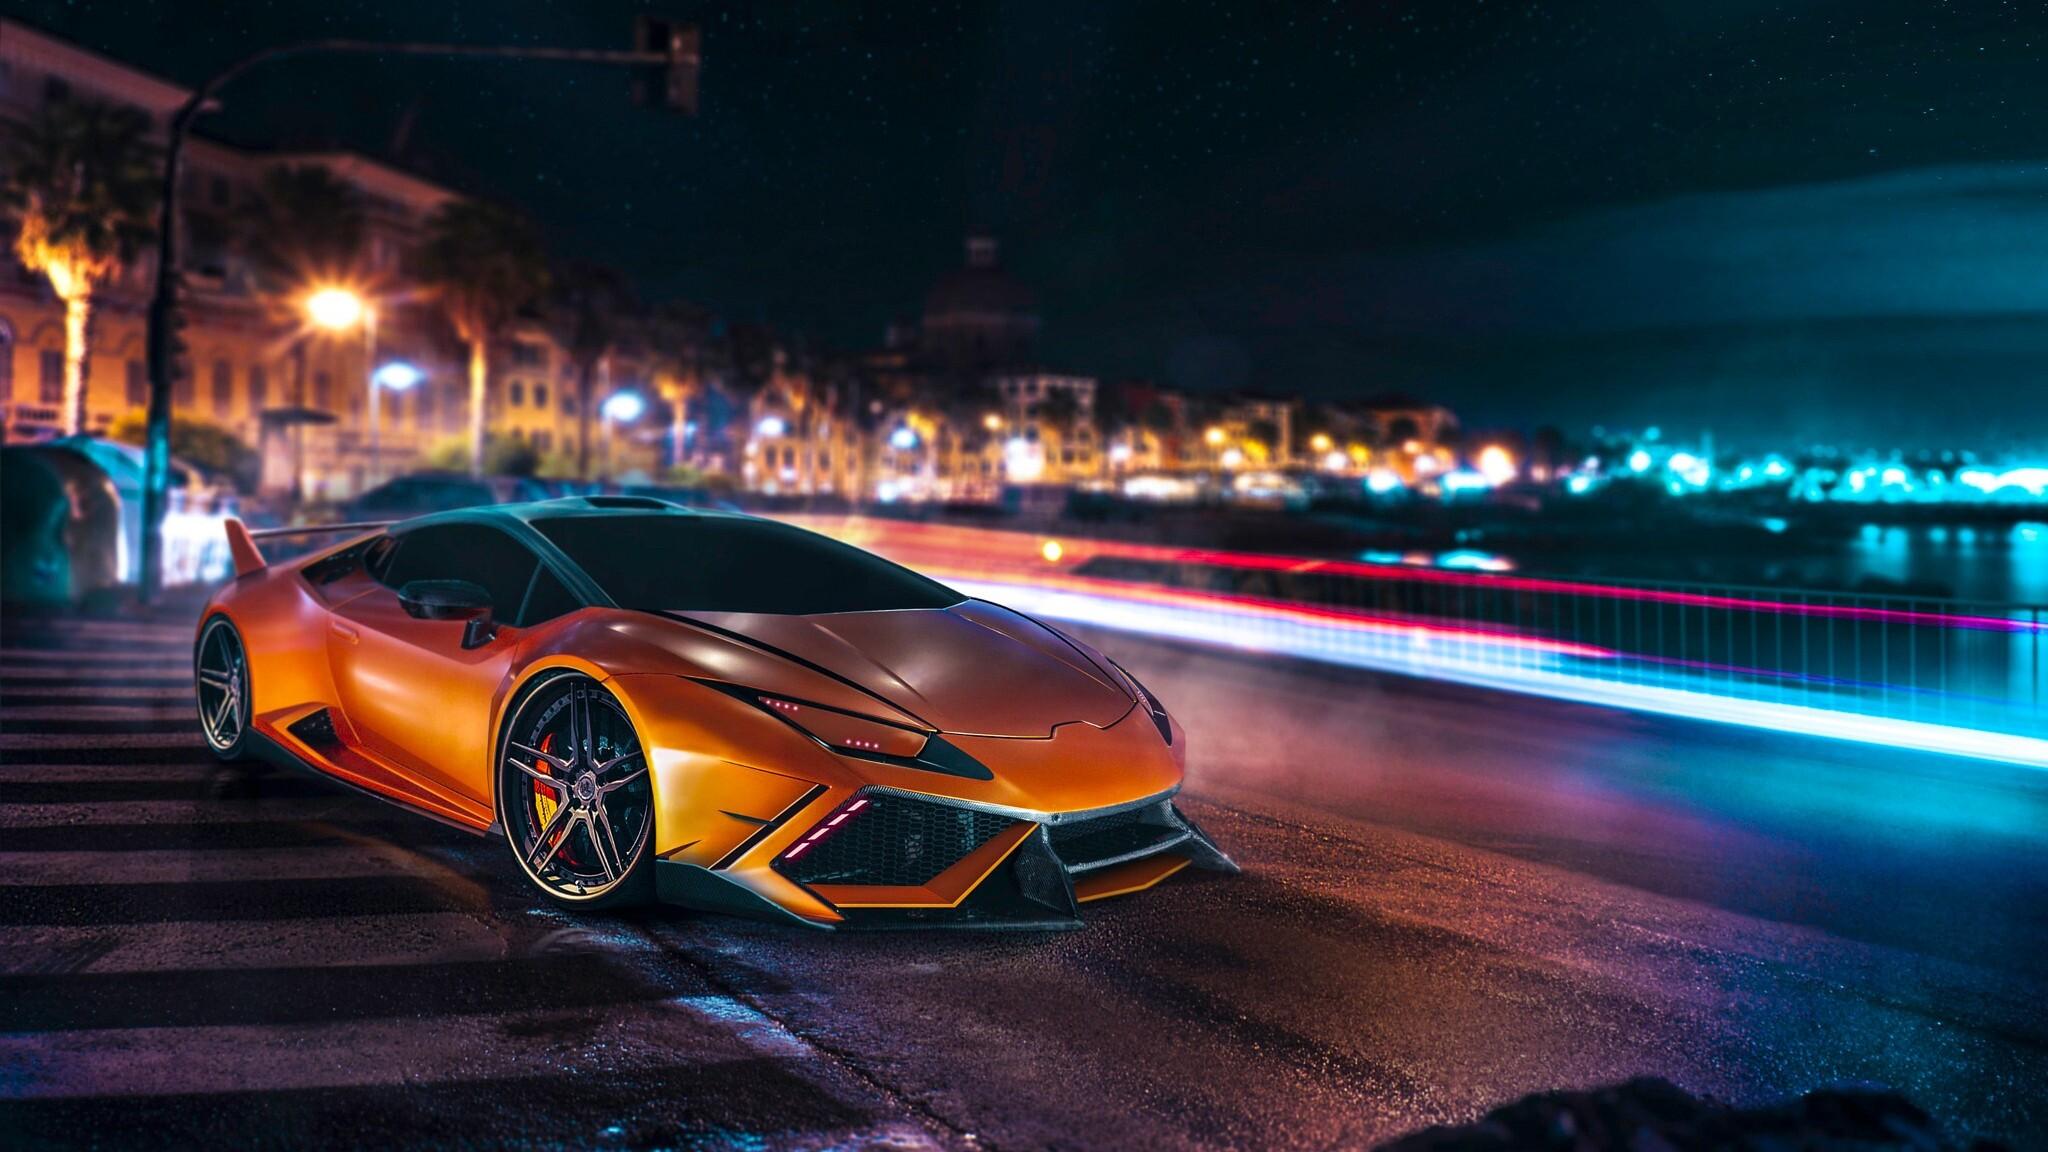 2048x1152 Lamborghini Huracan Full HD 2048x1152 Resolution